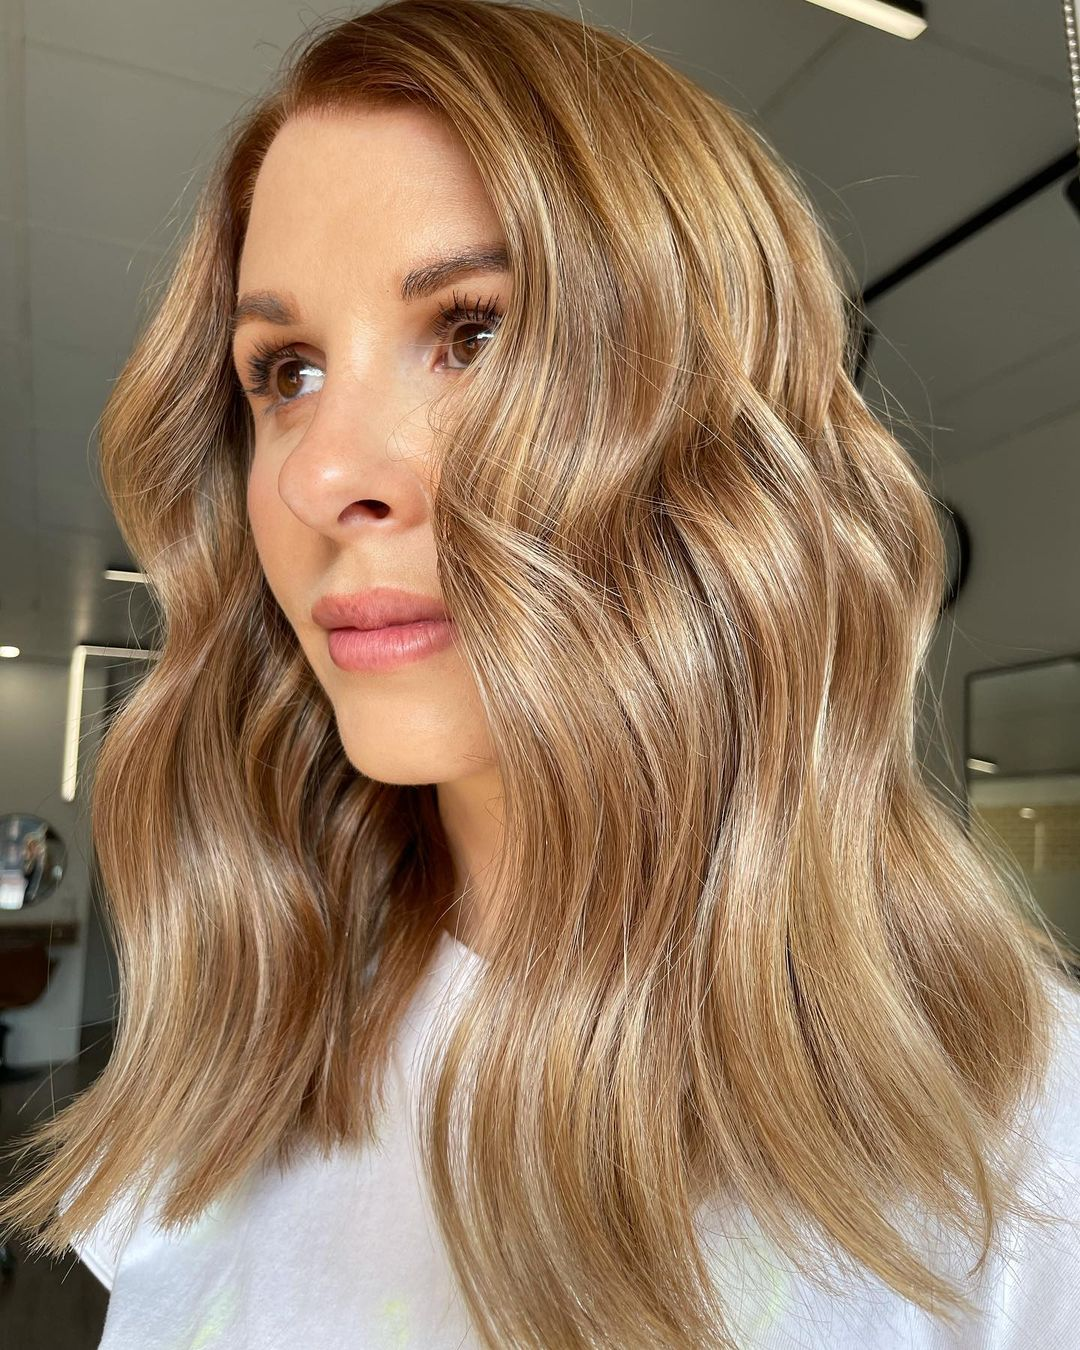 Caramel Hair with Golden Blonde Highlights